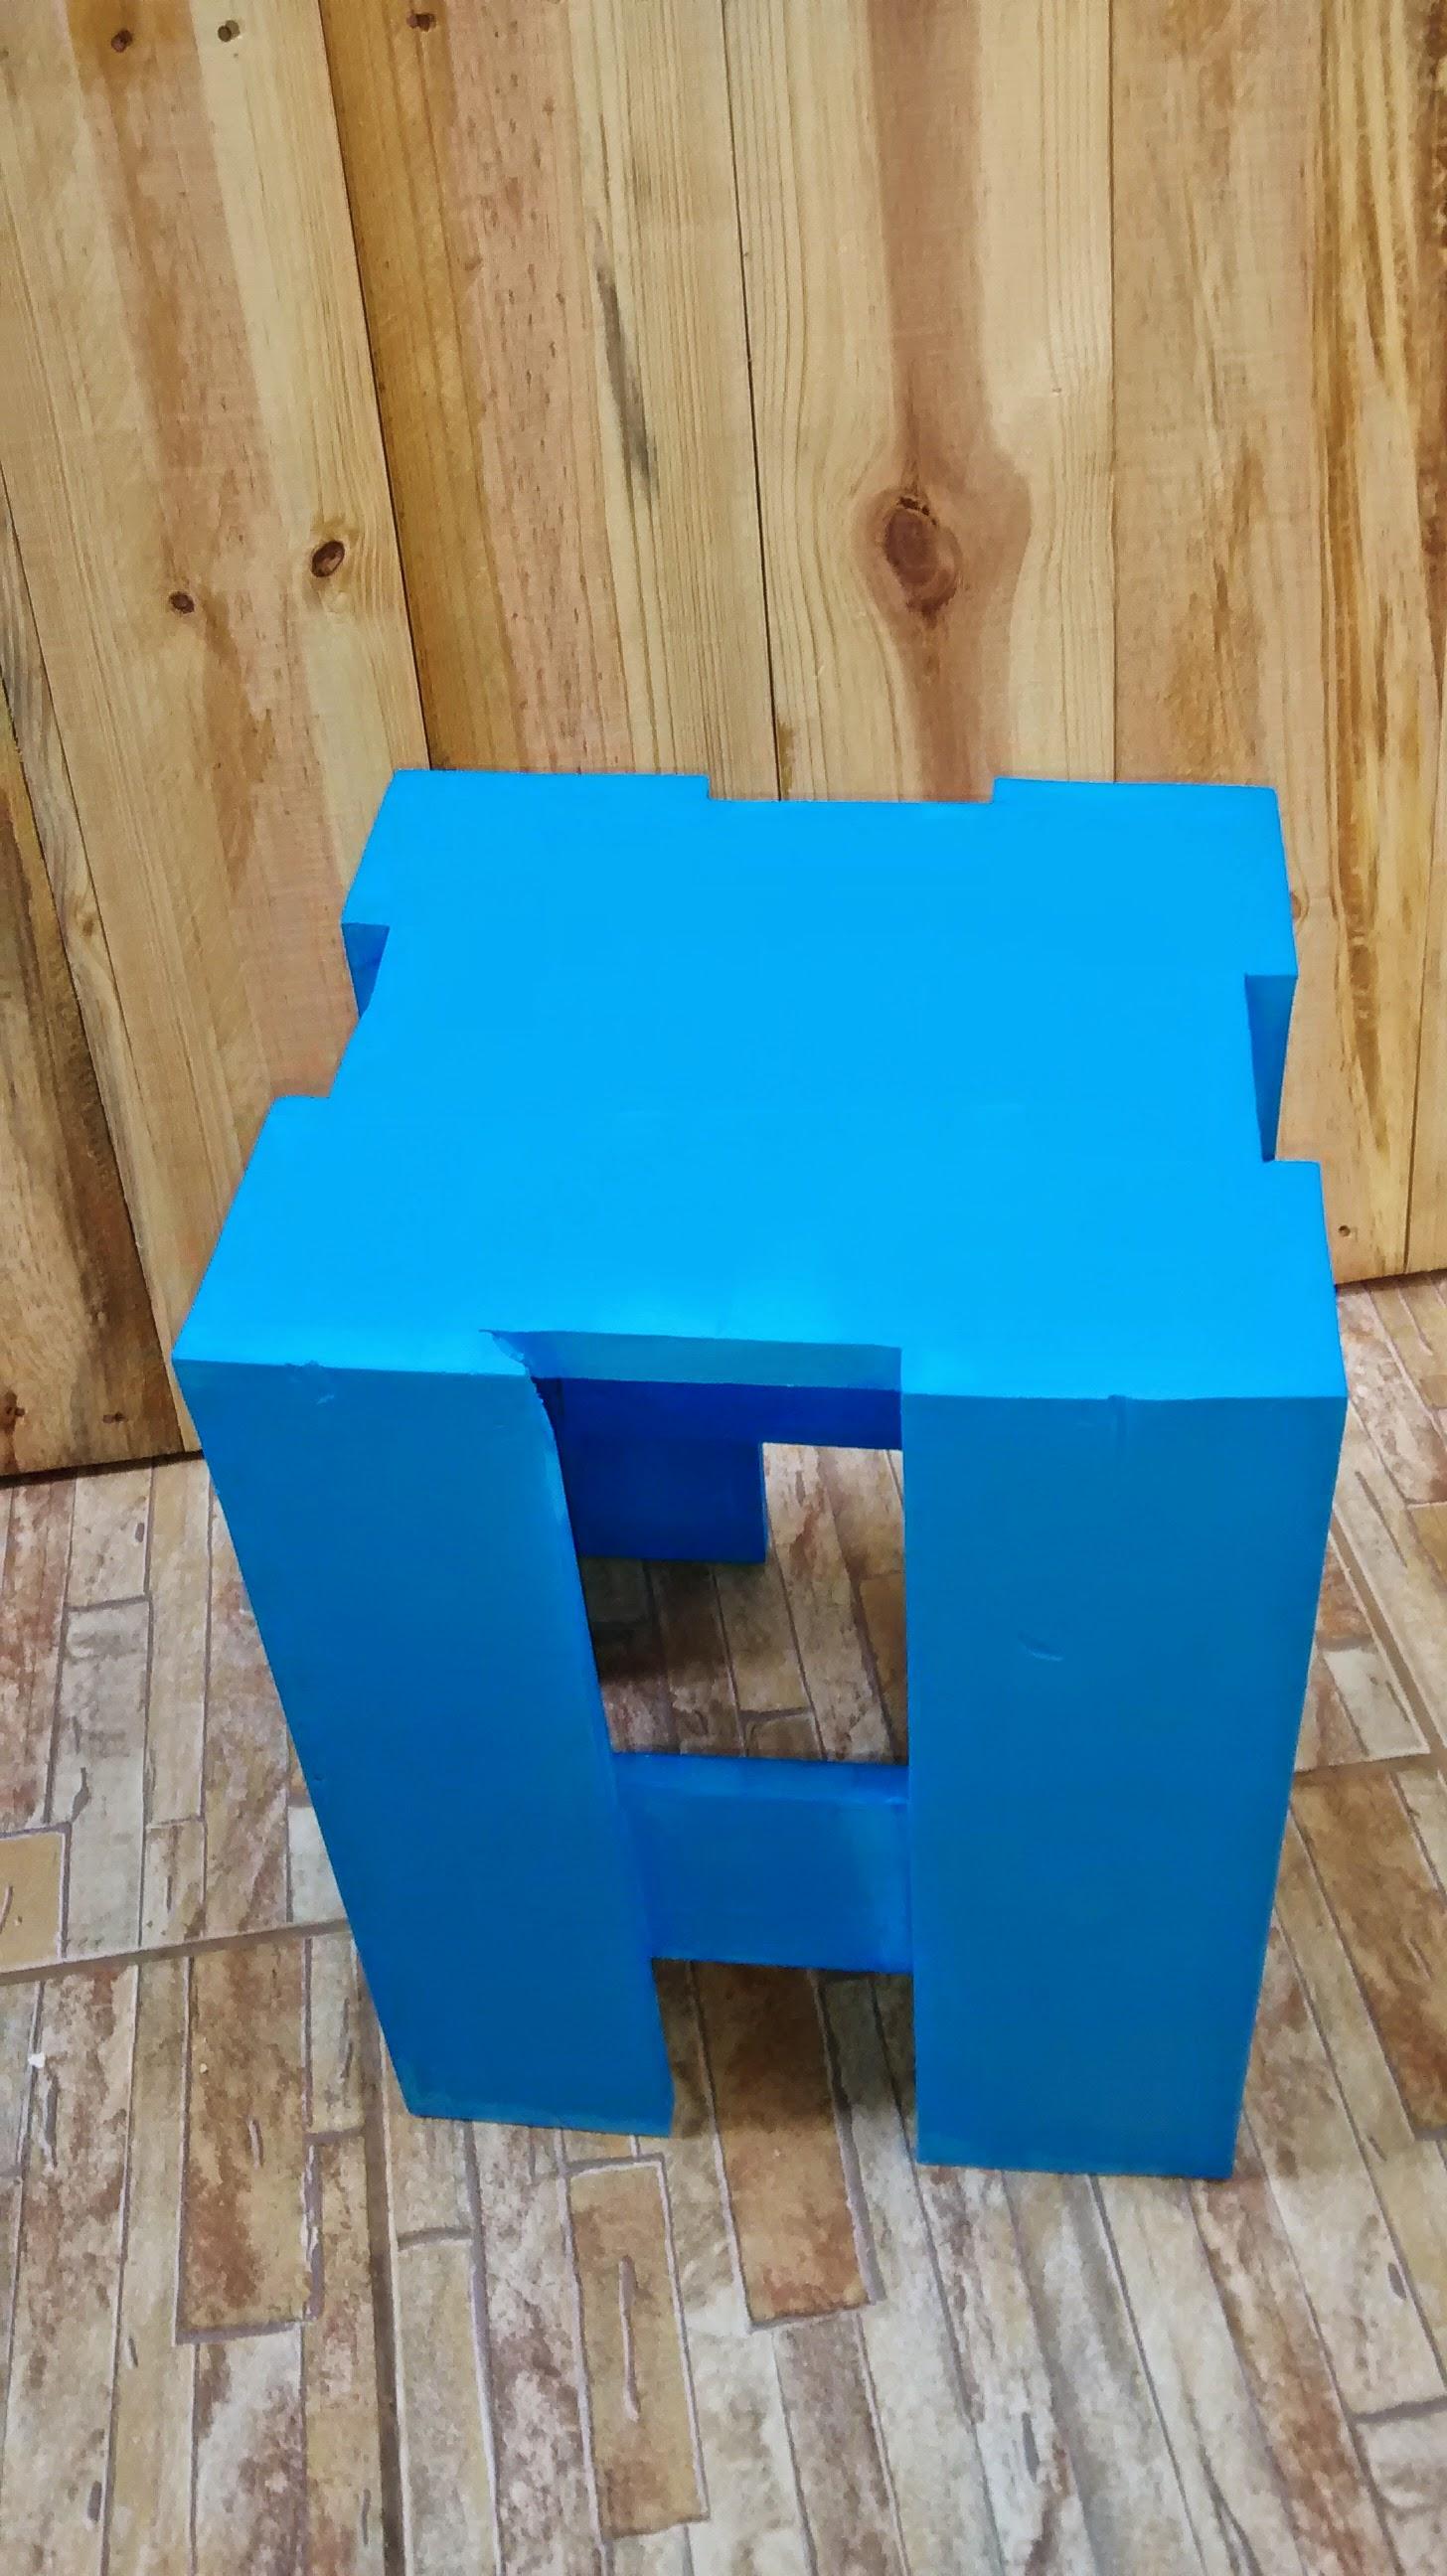 banco de madeira pallet banco de pallet banco de madeira banqueta #00448C 1456x2592